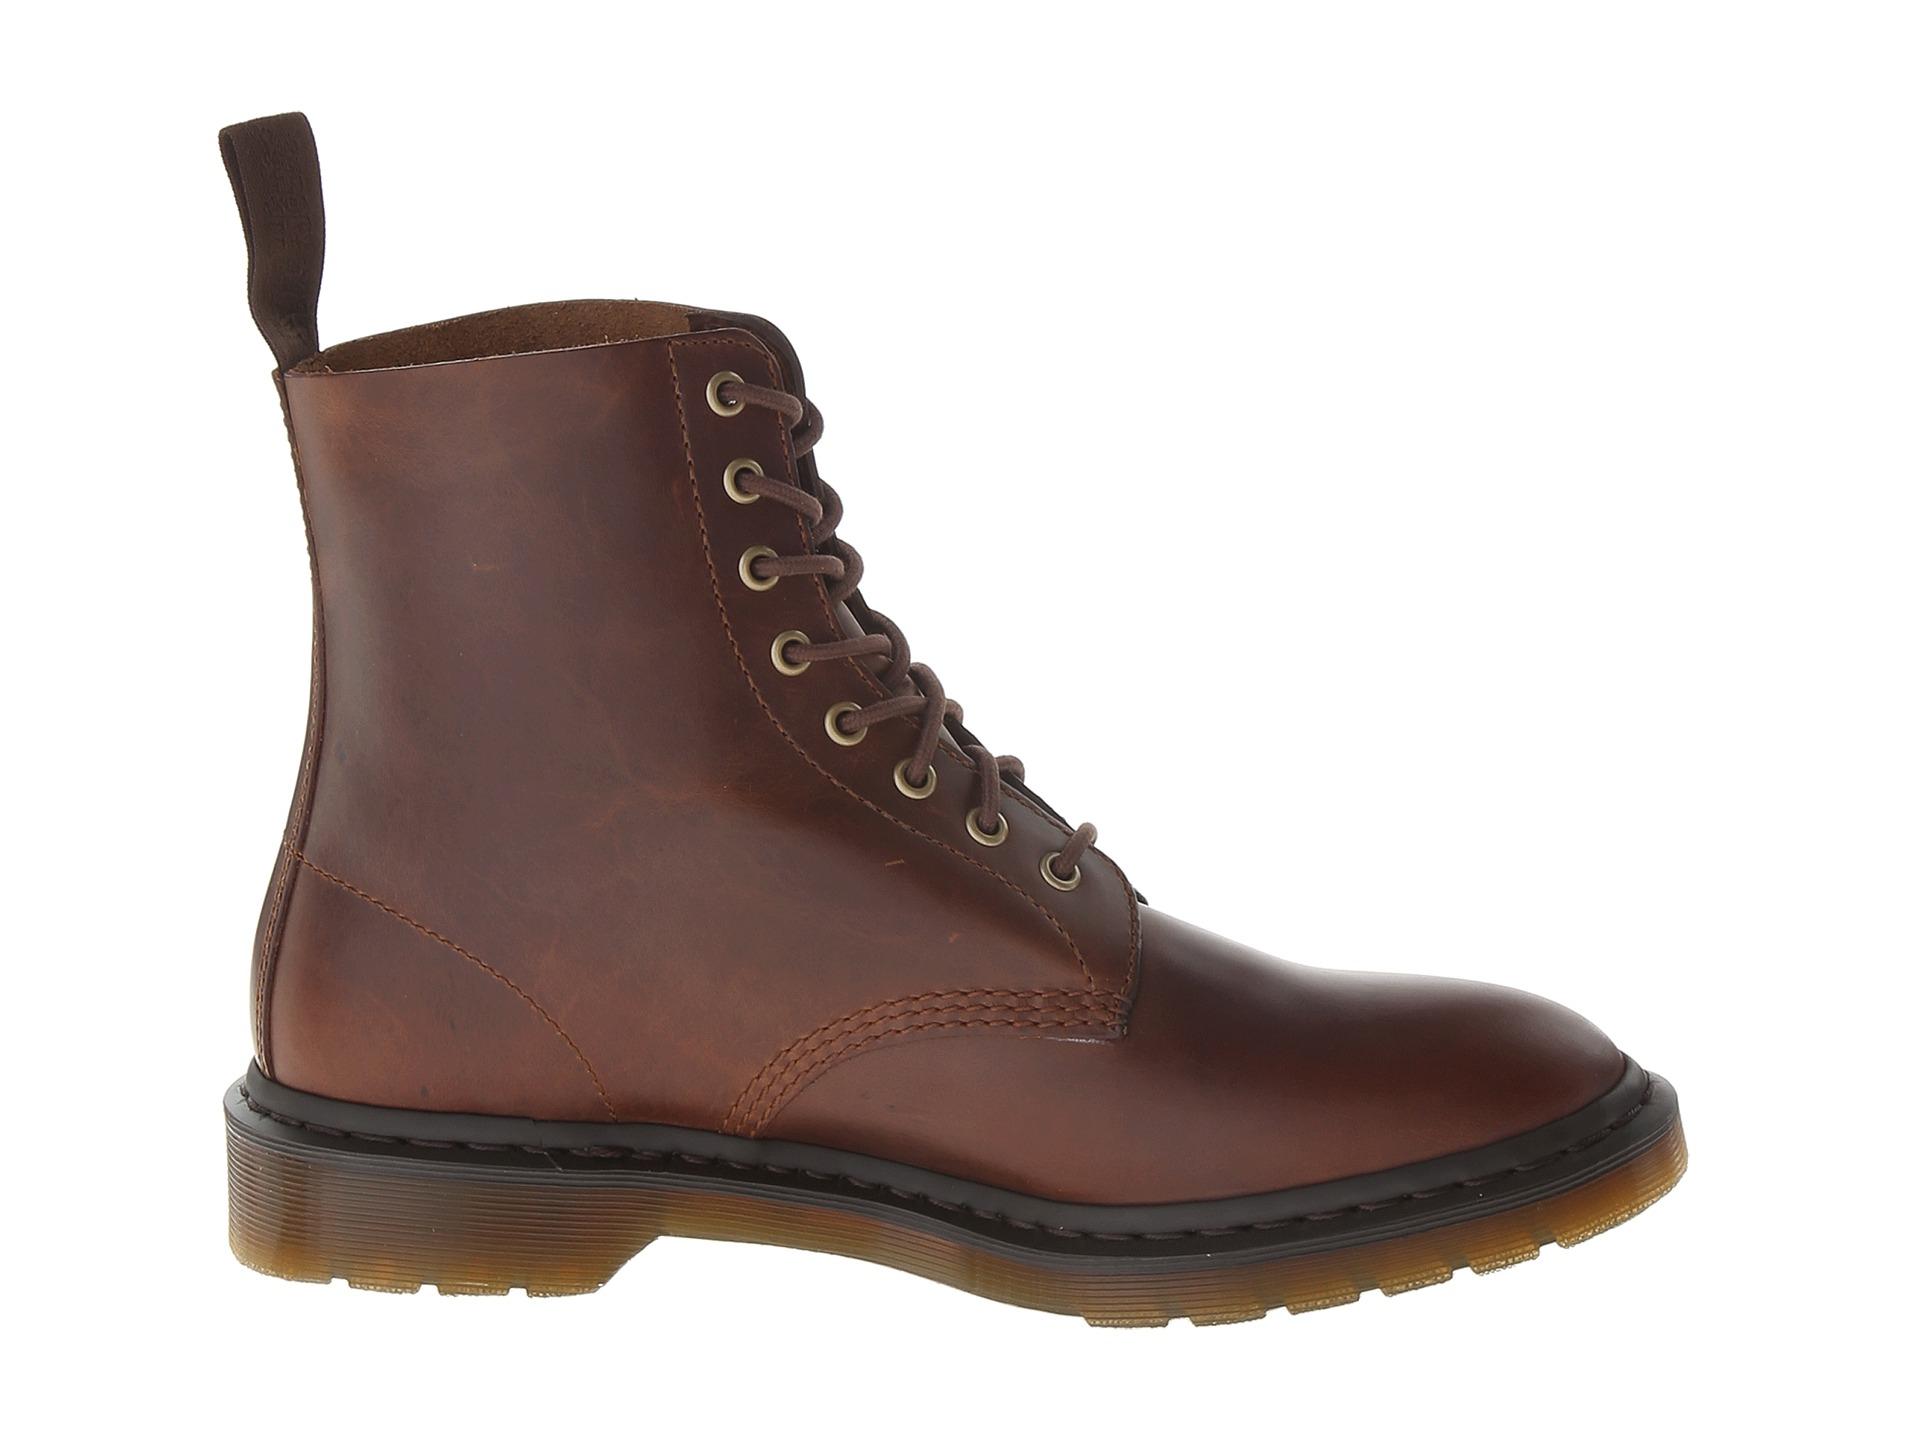 lyst dr martens pascal 8 eye boot in brown for men. Black Bedroom Furniture Sets. Home Design Ideas